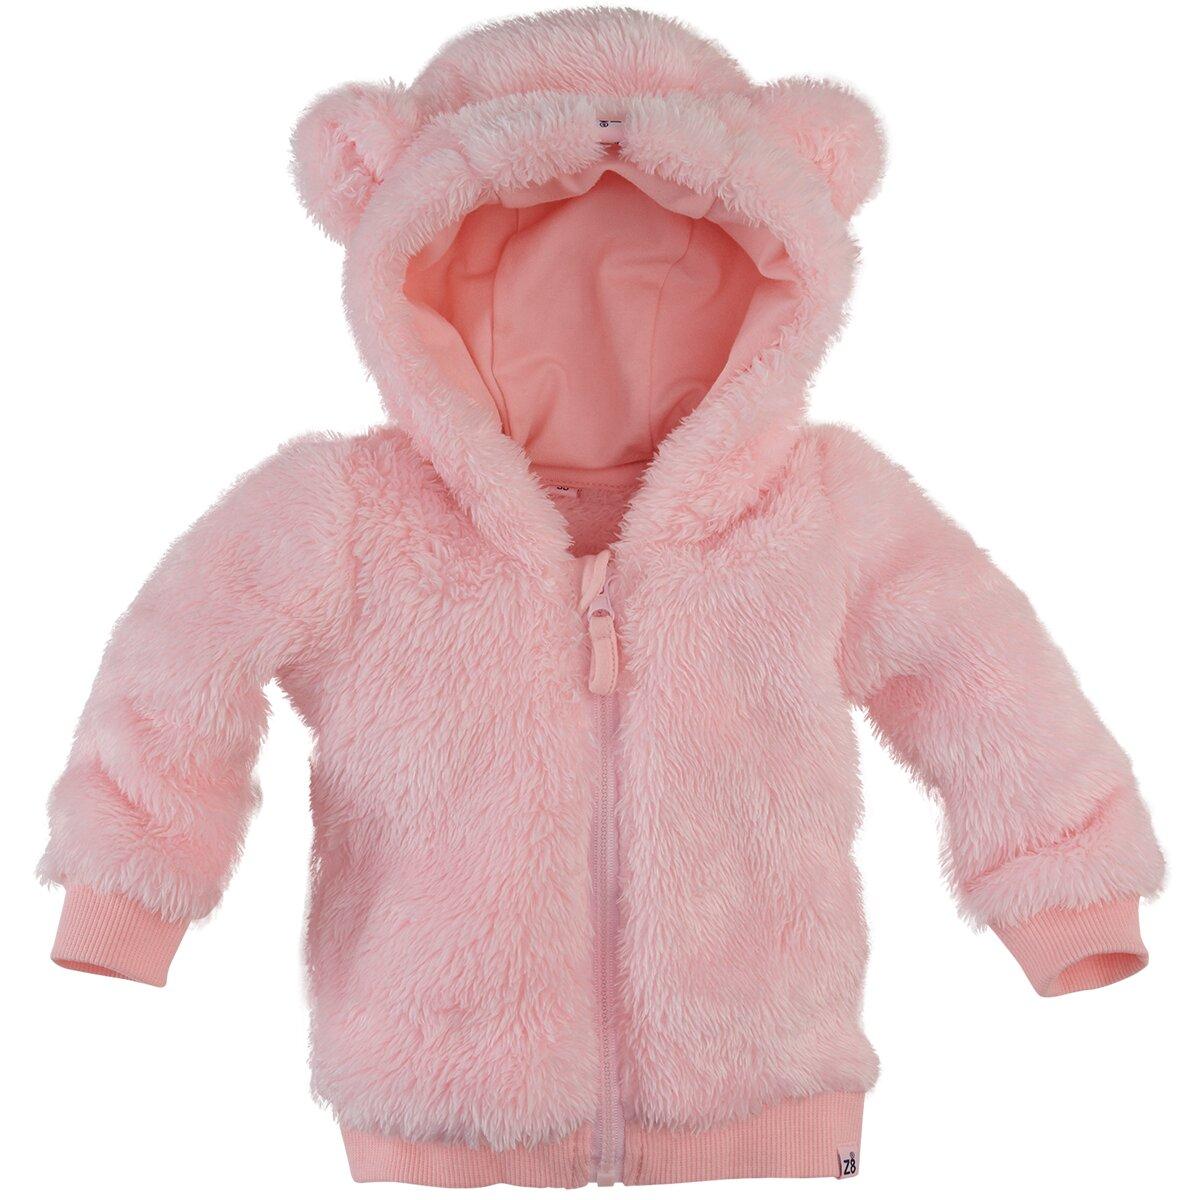 z8-newborn-noos190000nicky-pink